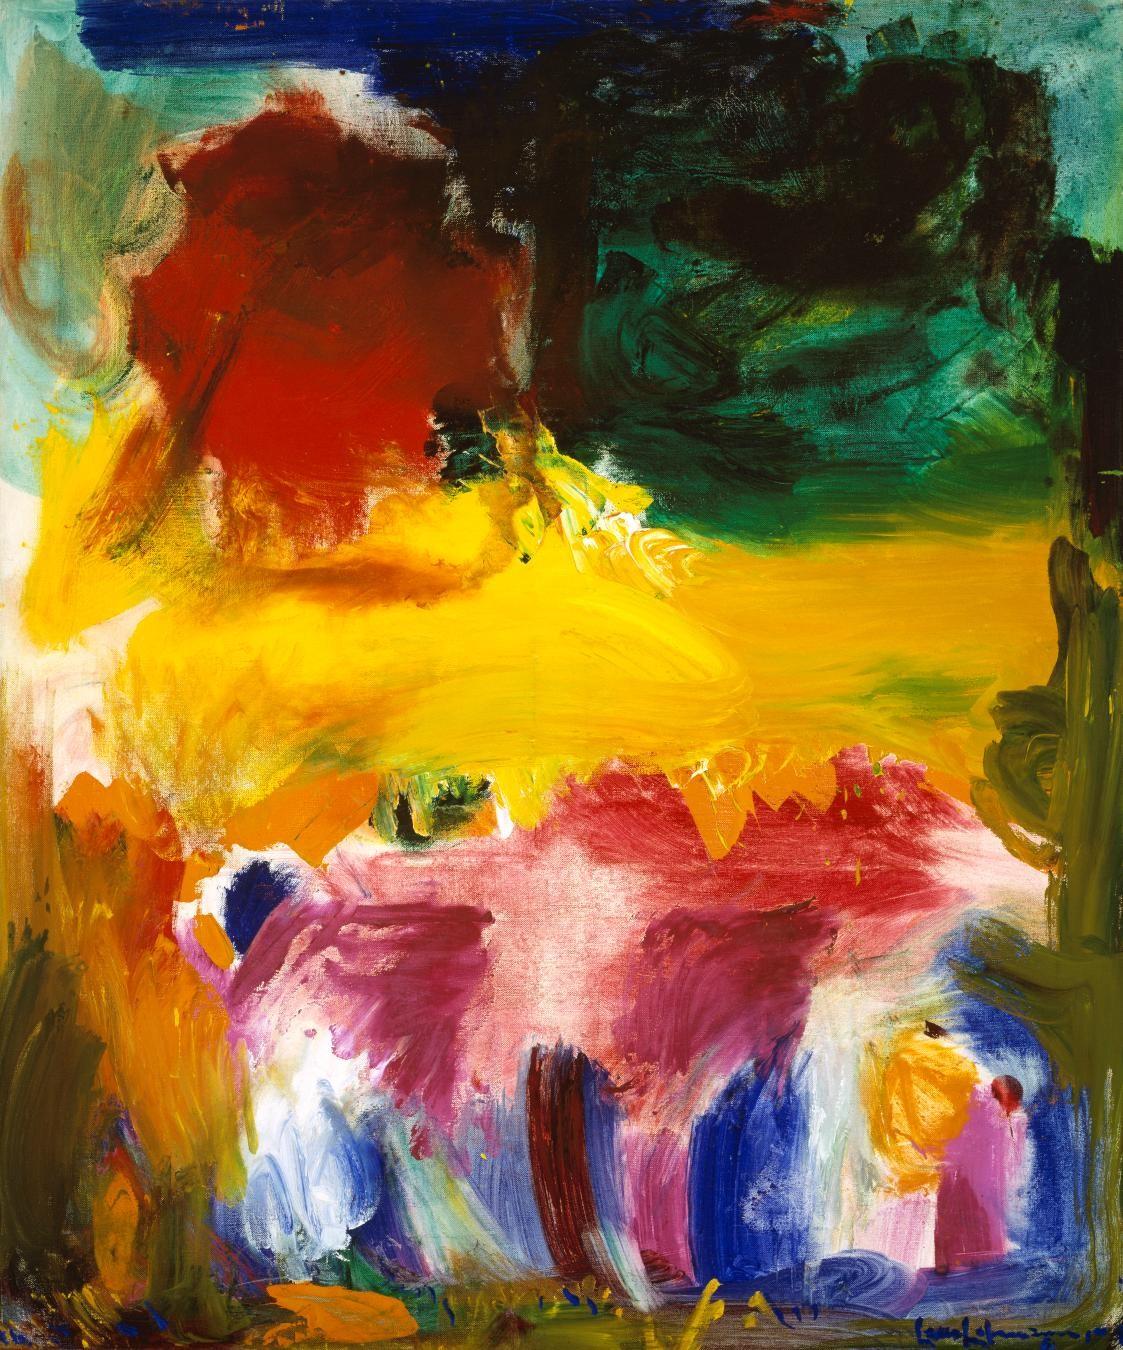 FOR SUN BLOG POST ONLY - Hans Hofmann, Fiat Lux